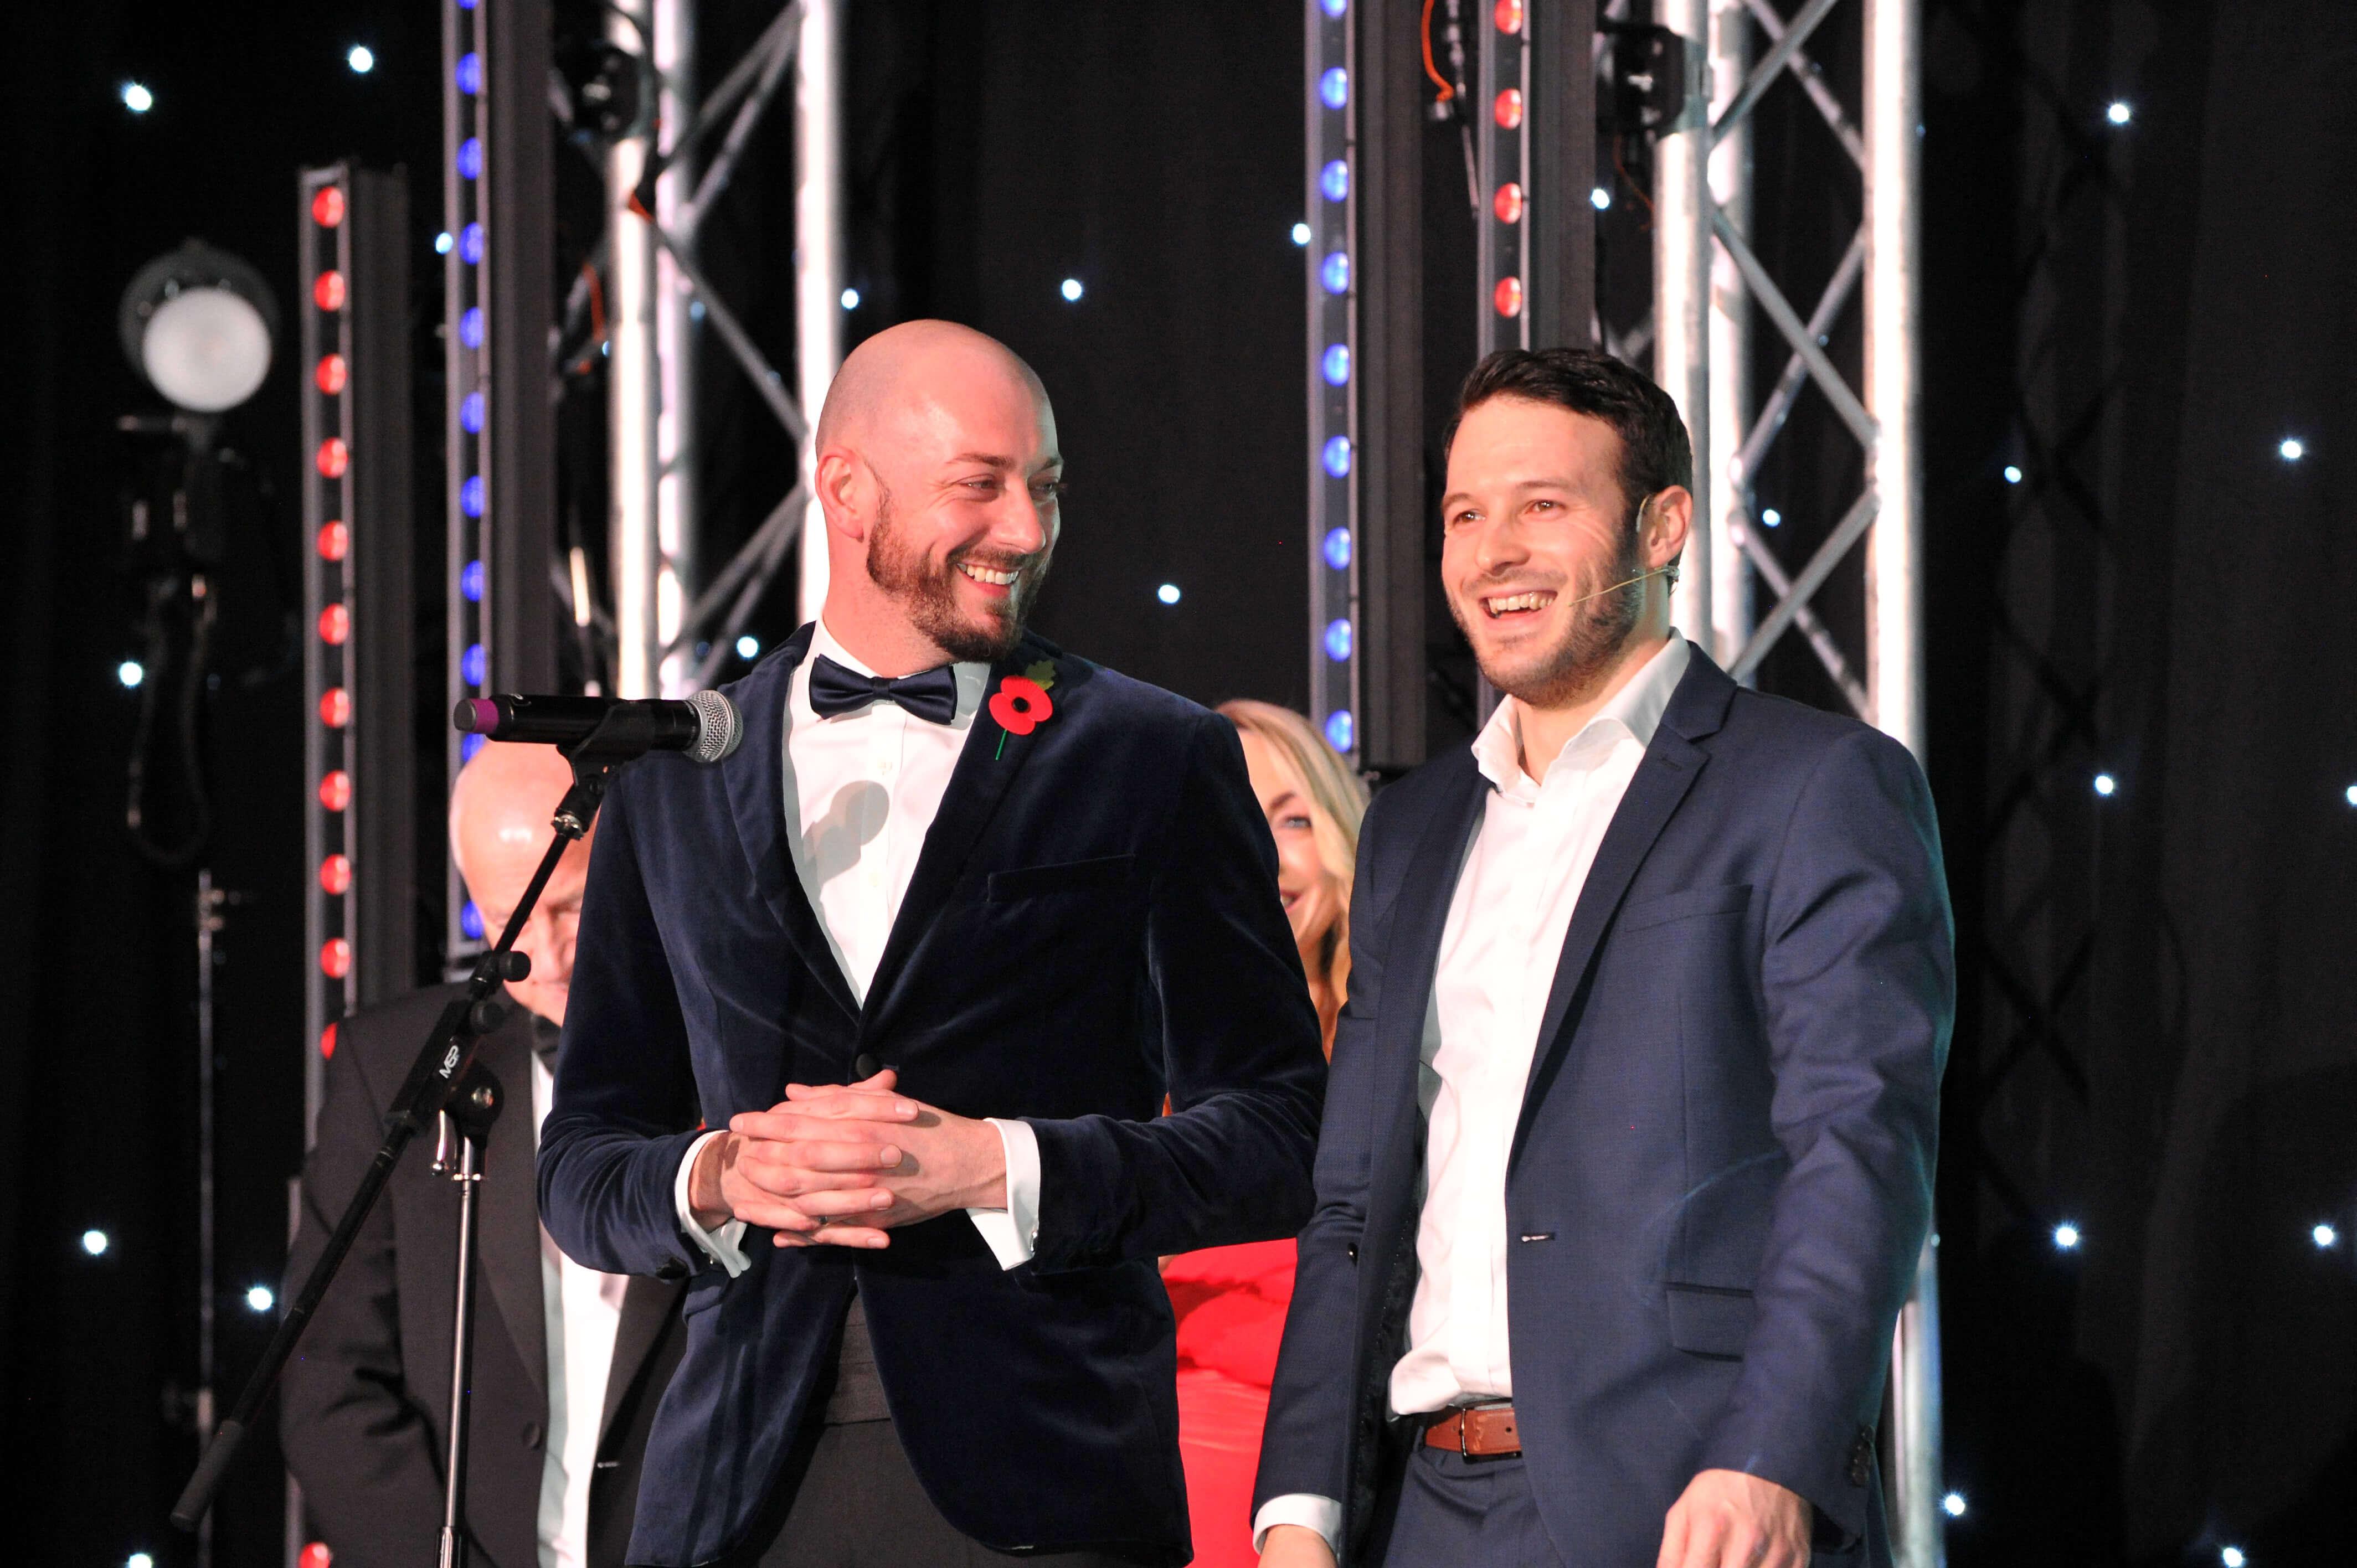 Aaron Calvert Manchester Corporate Entertainment Business Awards